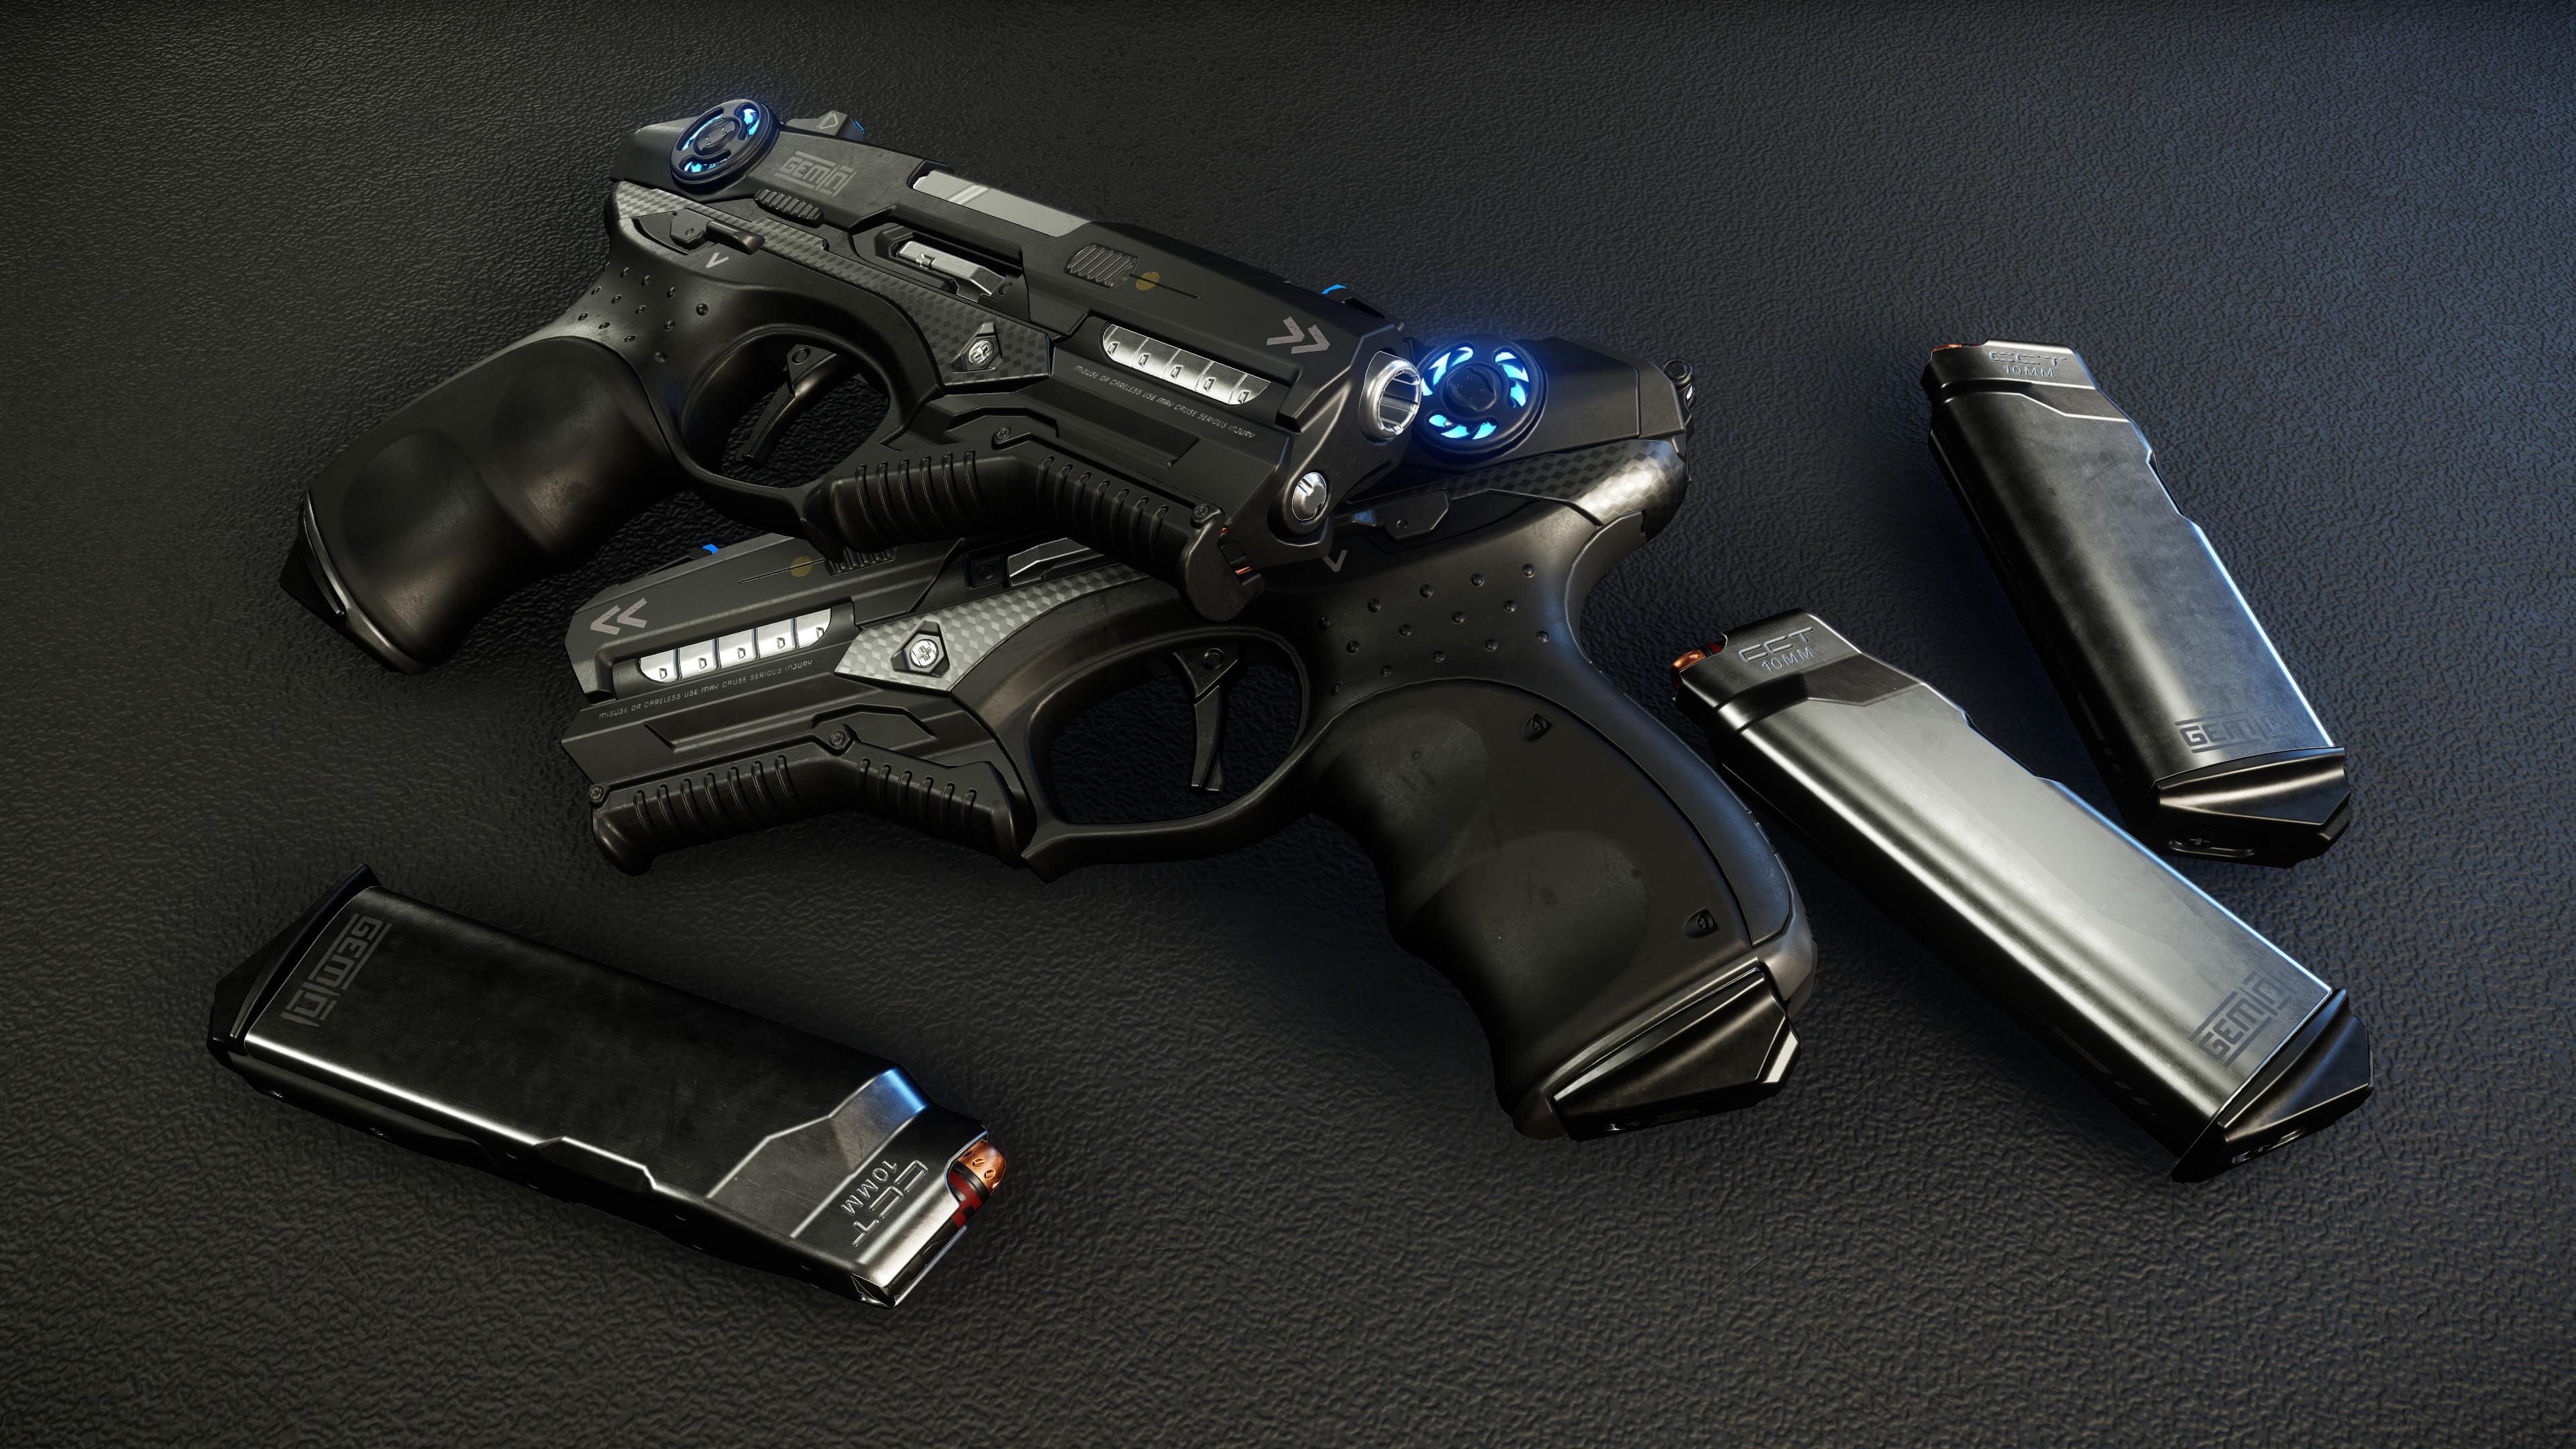 DE_ATV_StudioUpdate_Weapons_Gemini.jpg